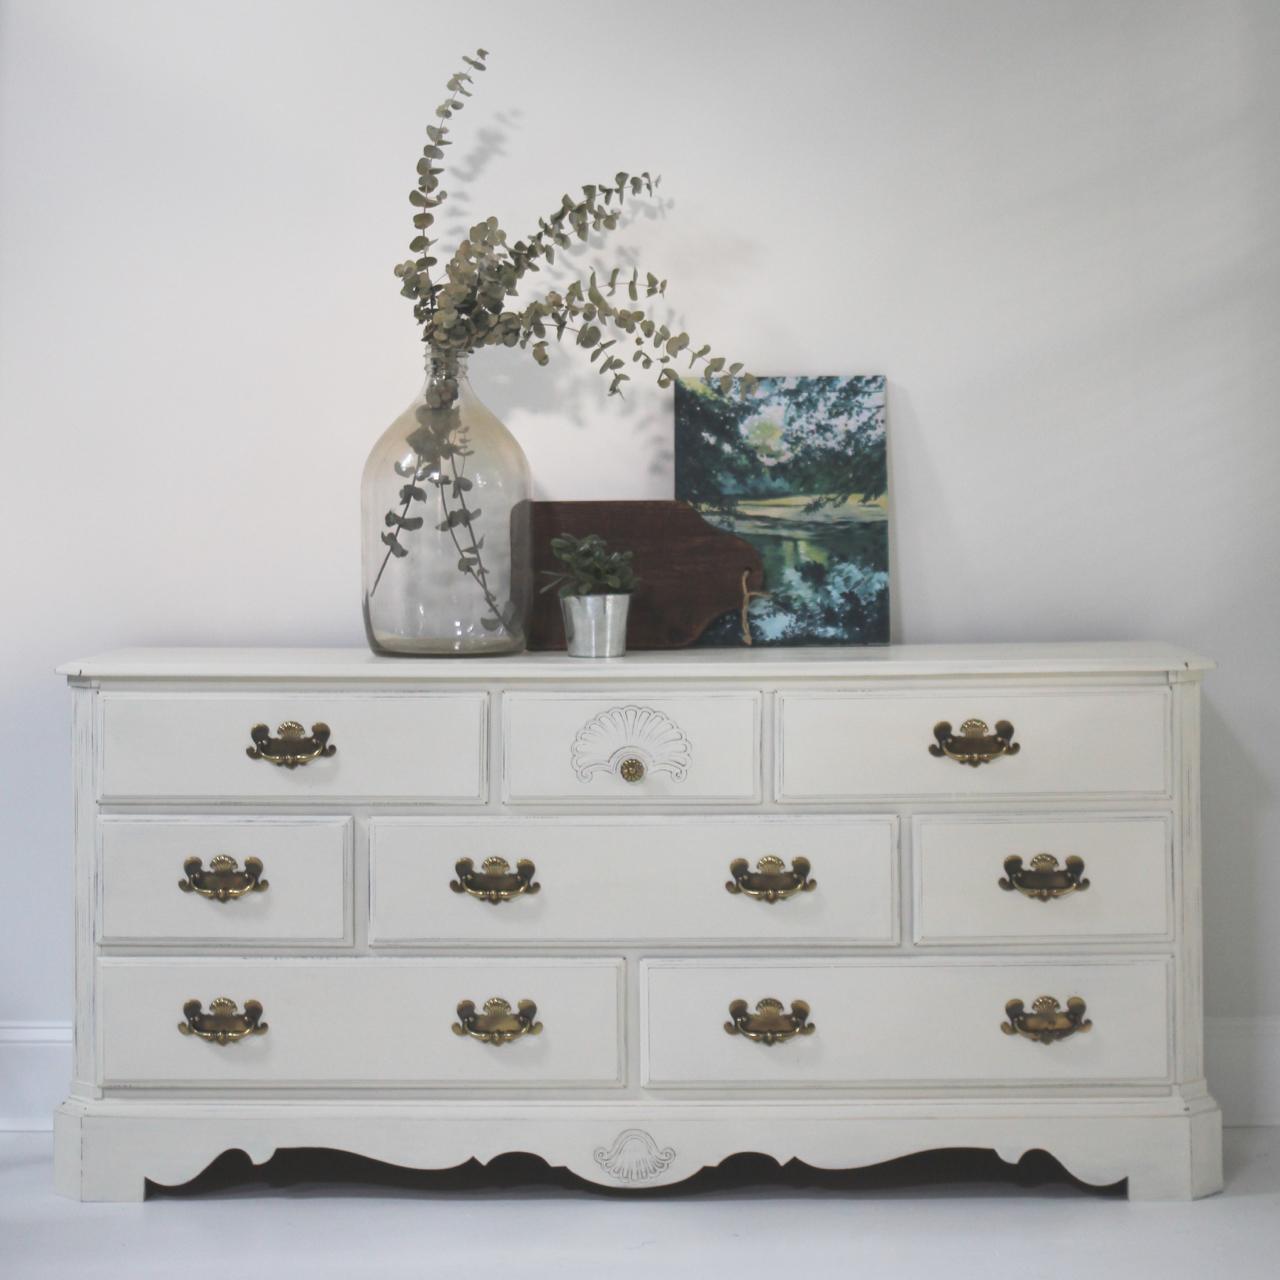 jo-torrijos-a-simpler-design-annie-sloan-old-white-dresser-1.jpg